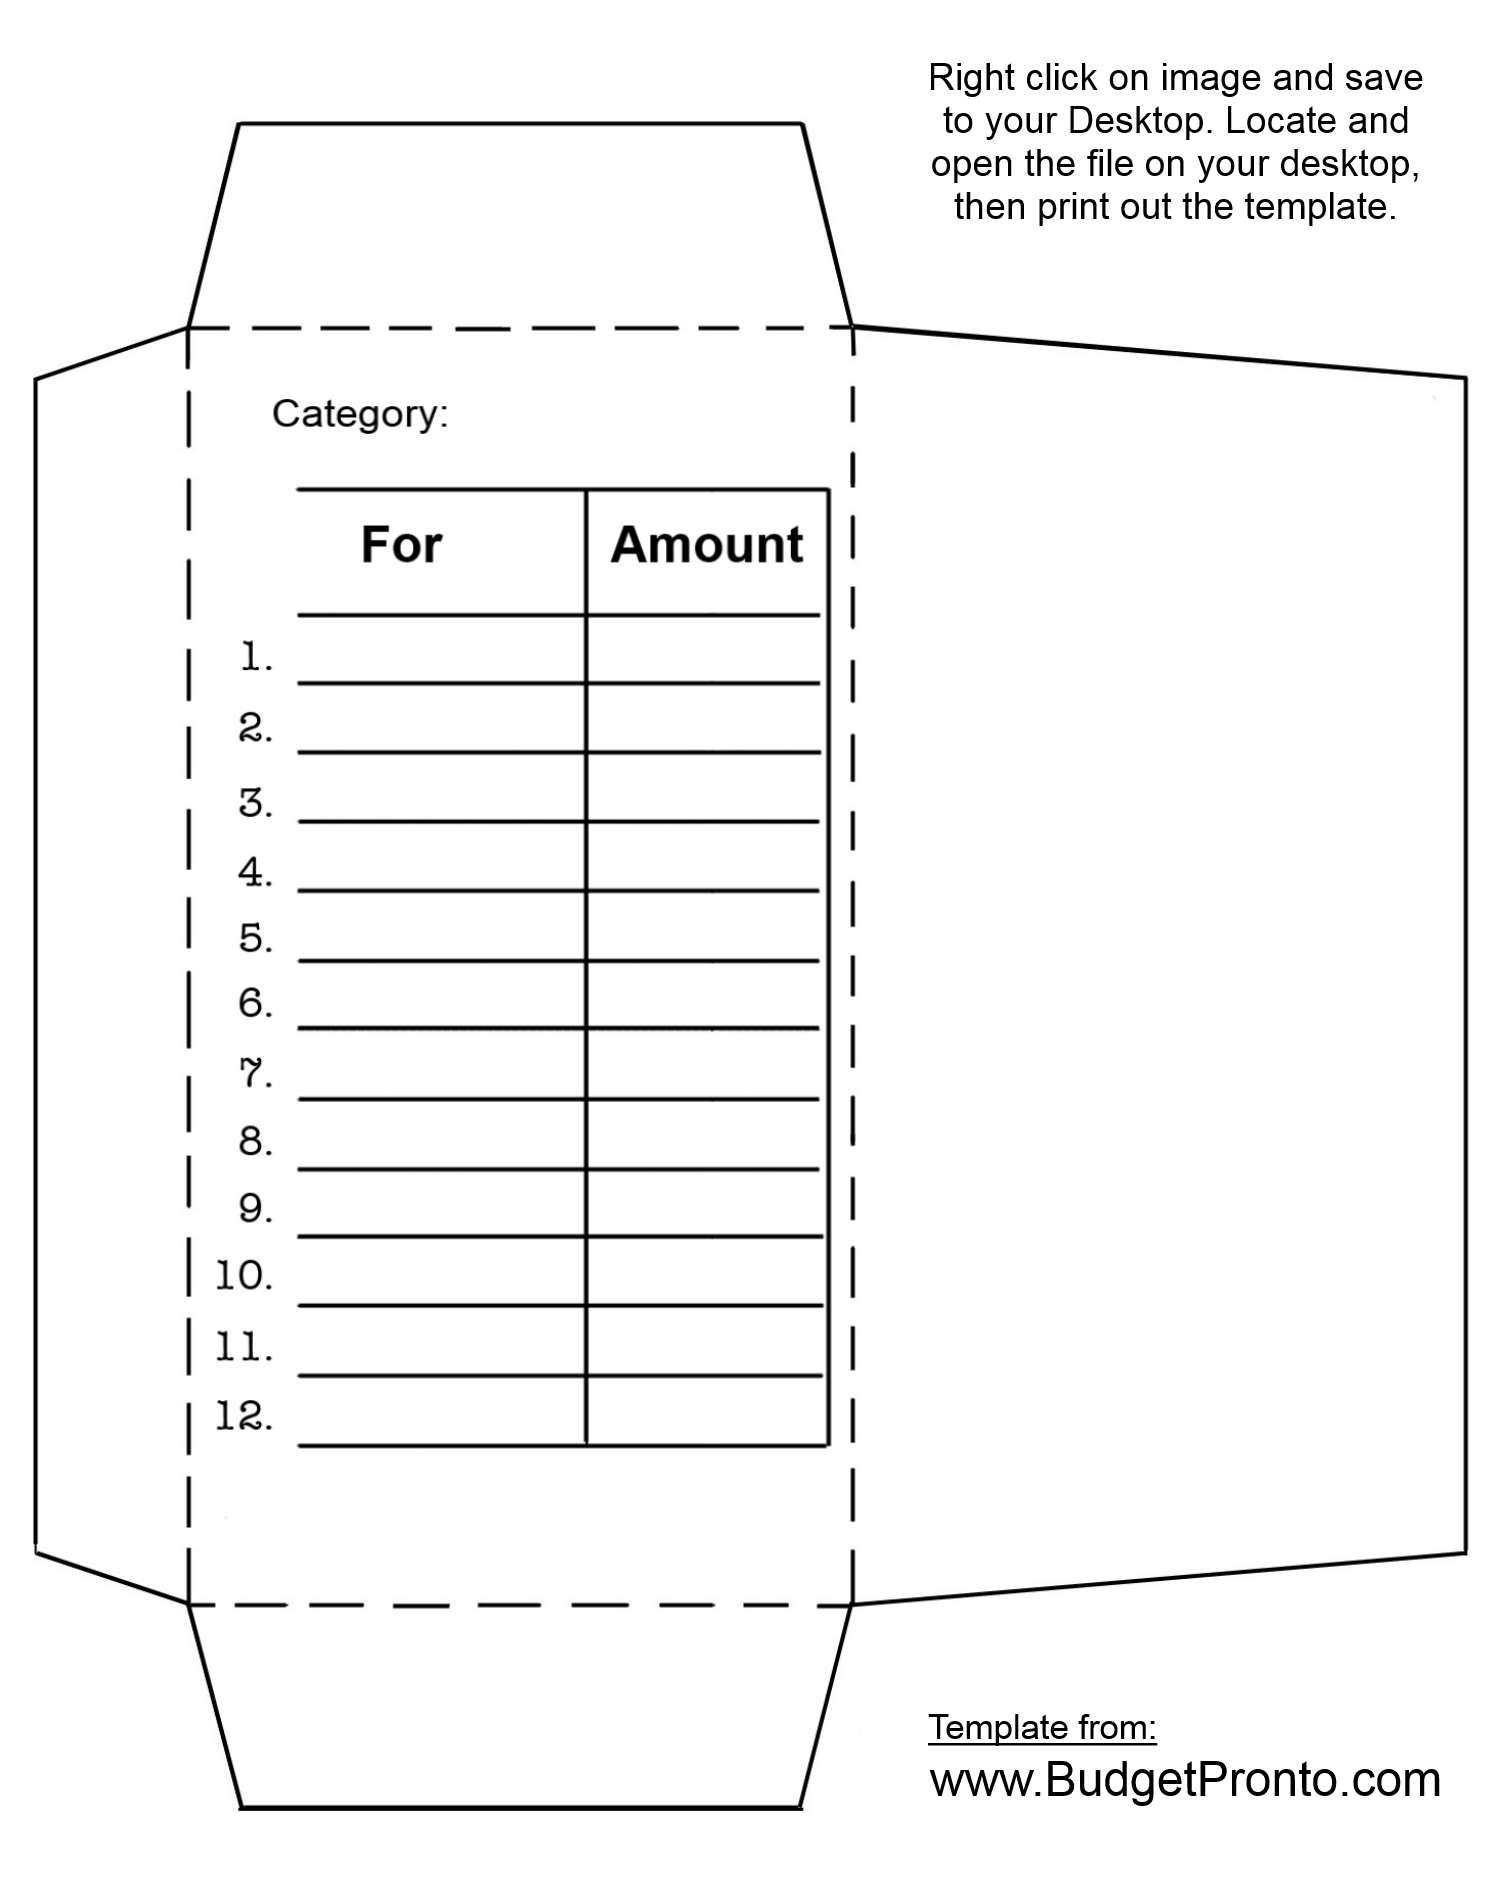 Cash Envelope Printout Template  Budgeting